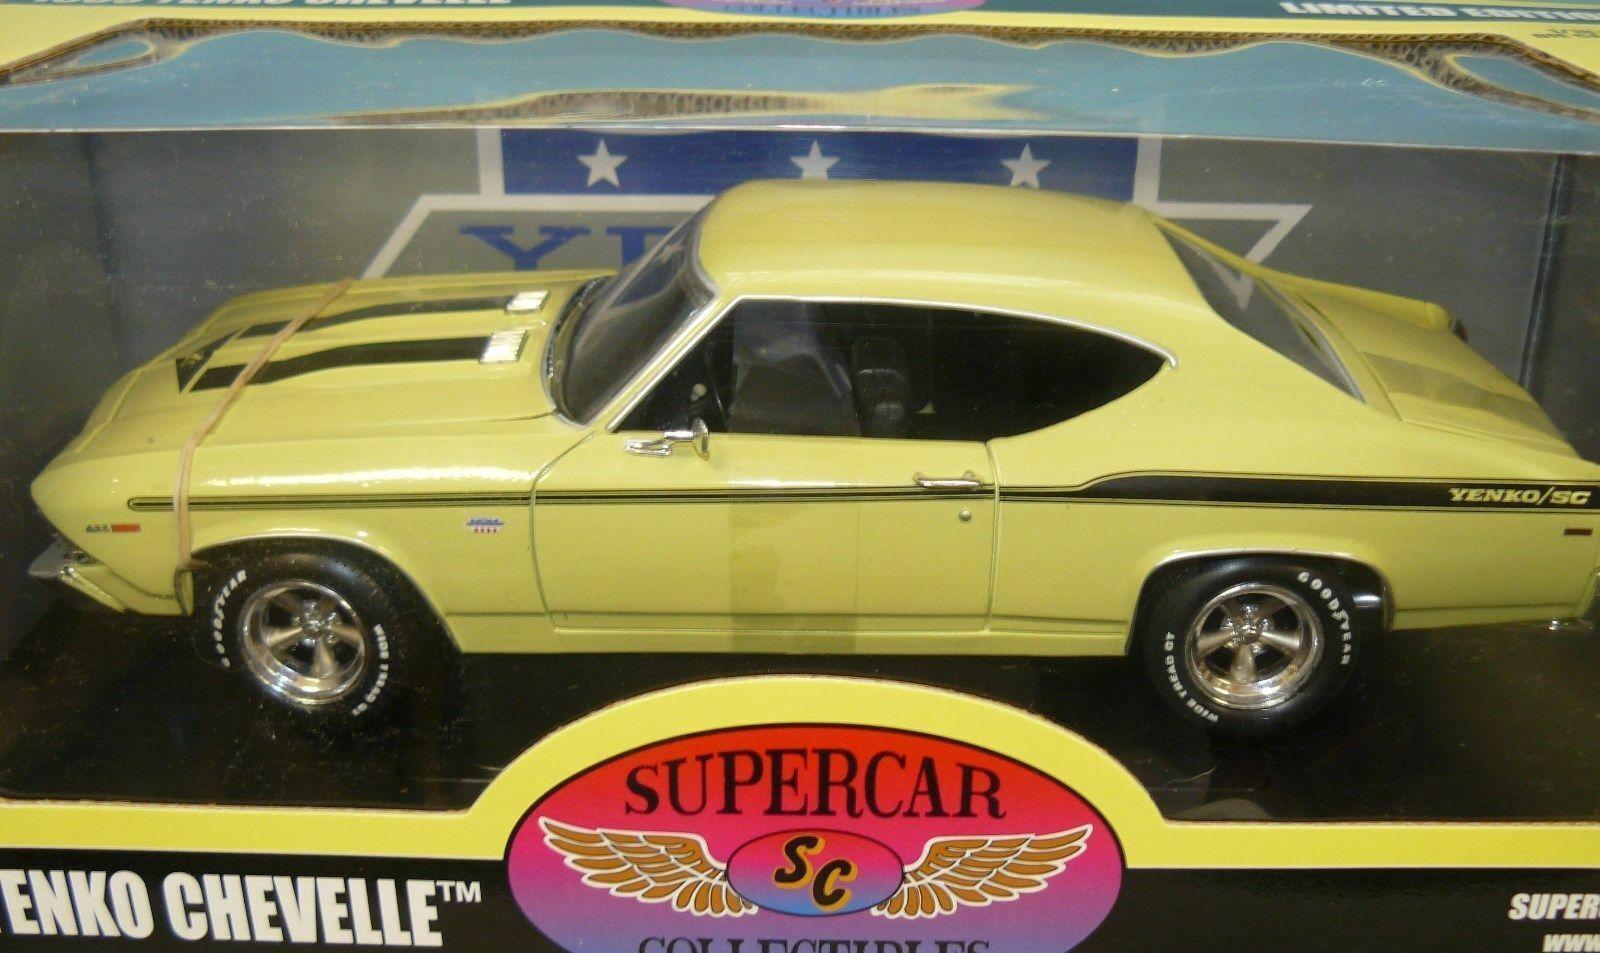 1  18 1969 Chevelle Yenco, ny i lådan, små färgfel